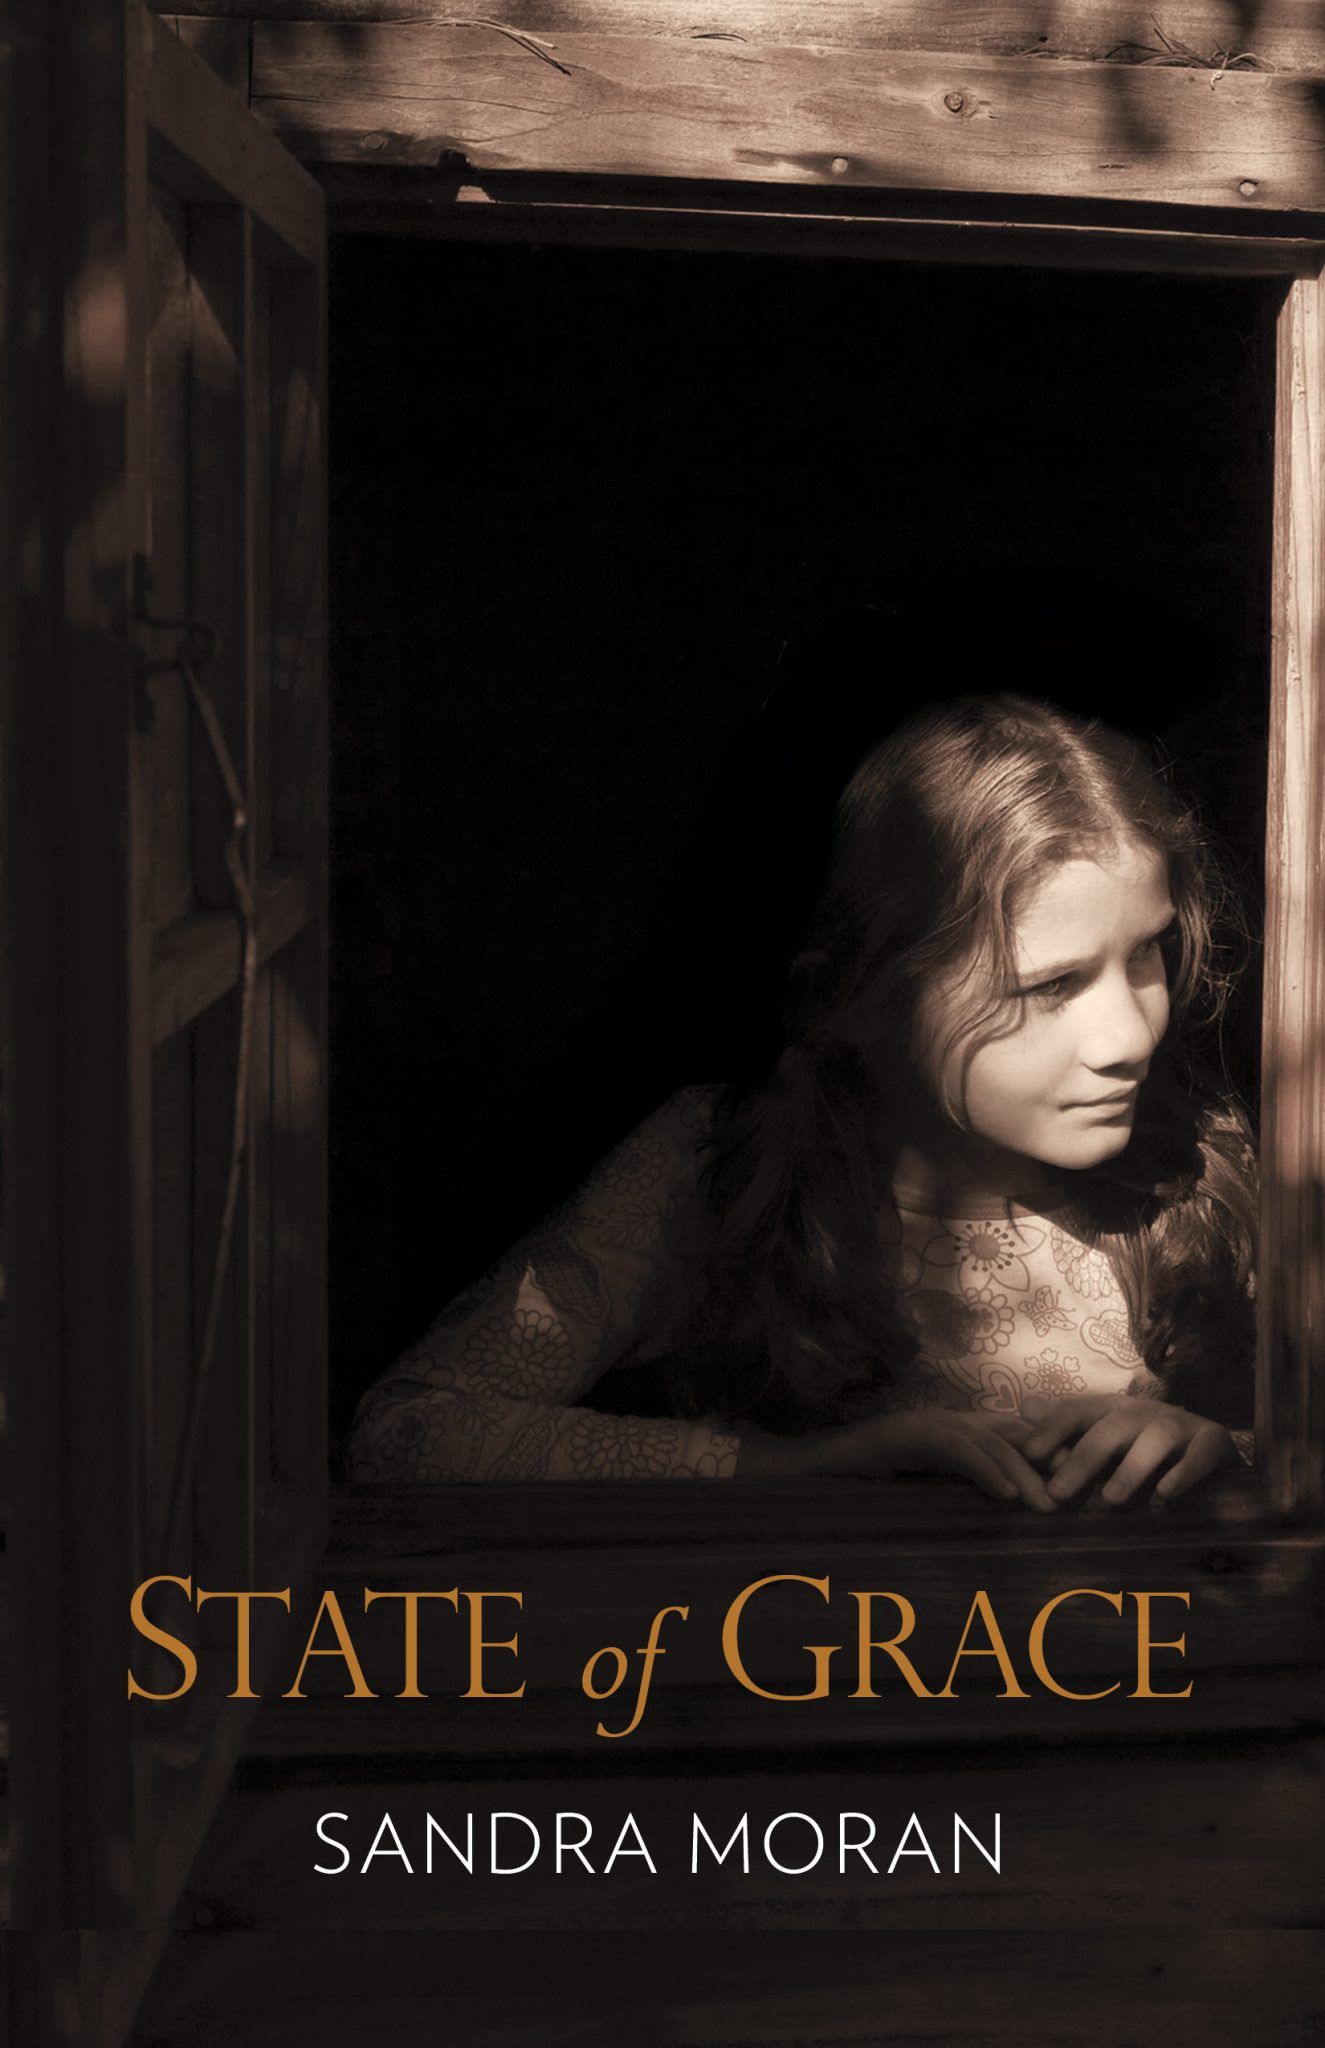 state-of-grace-sandra-moran